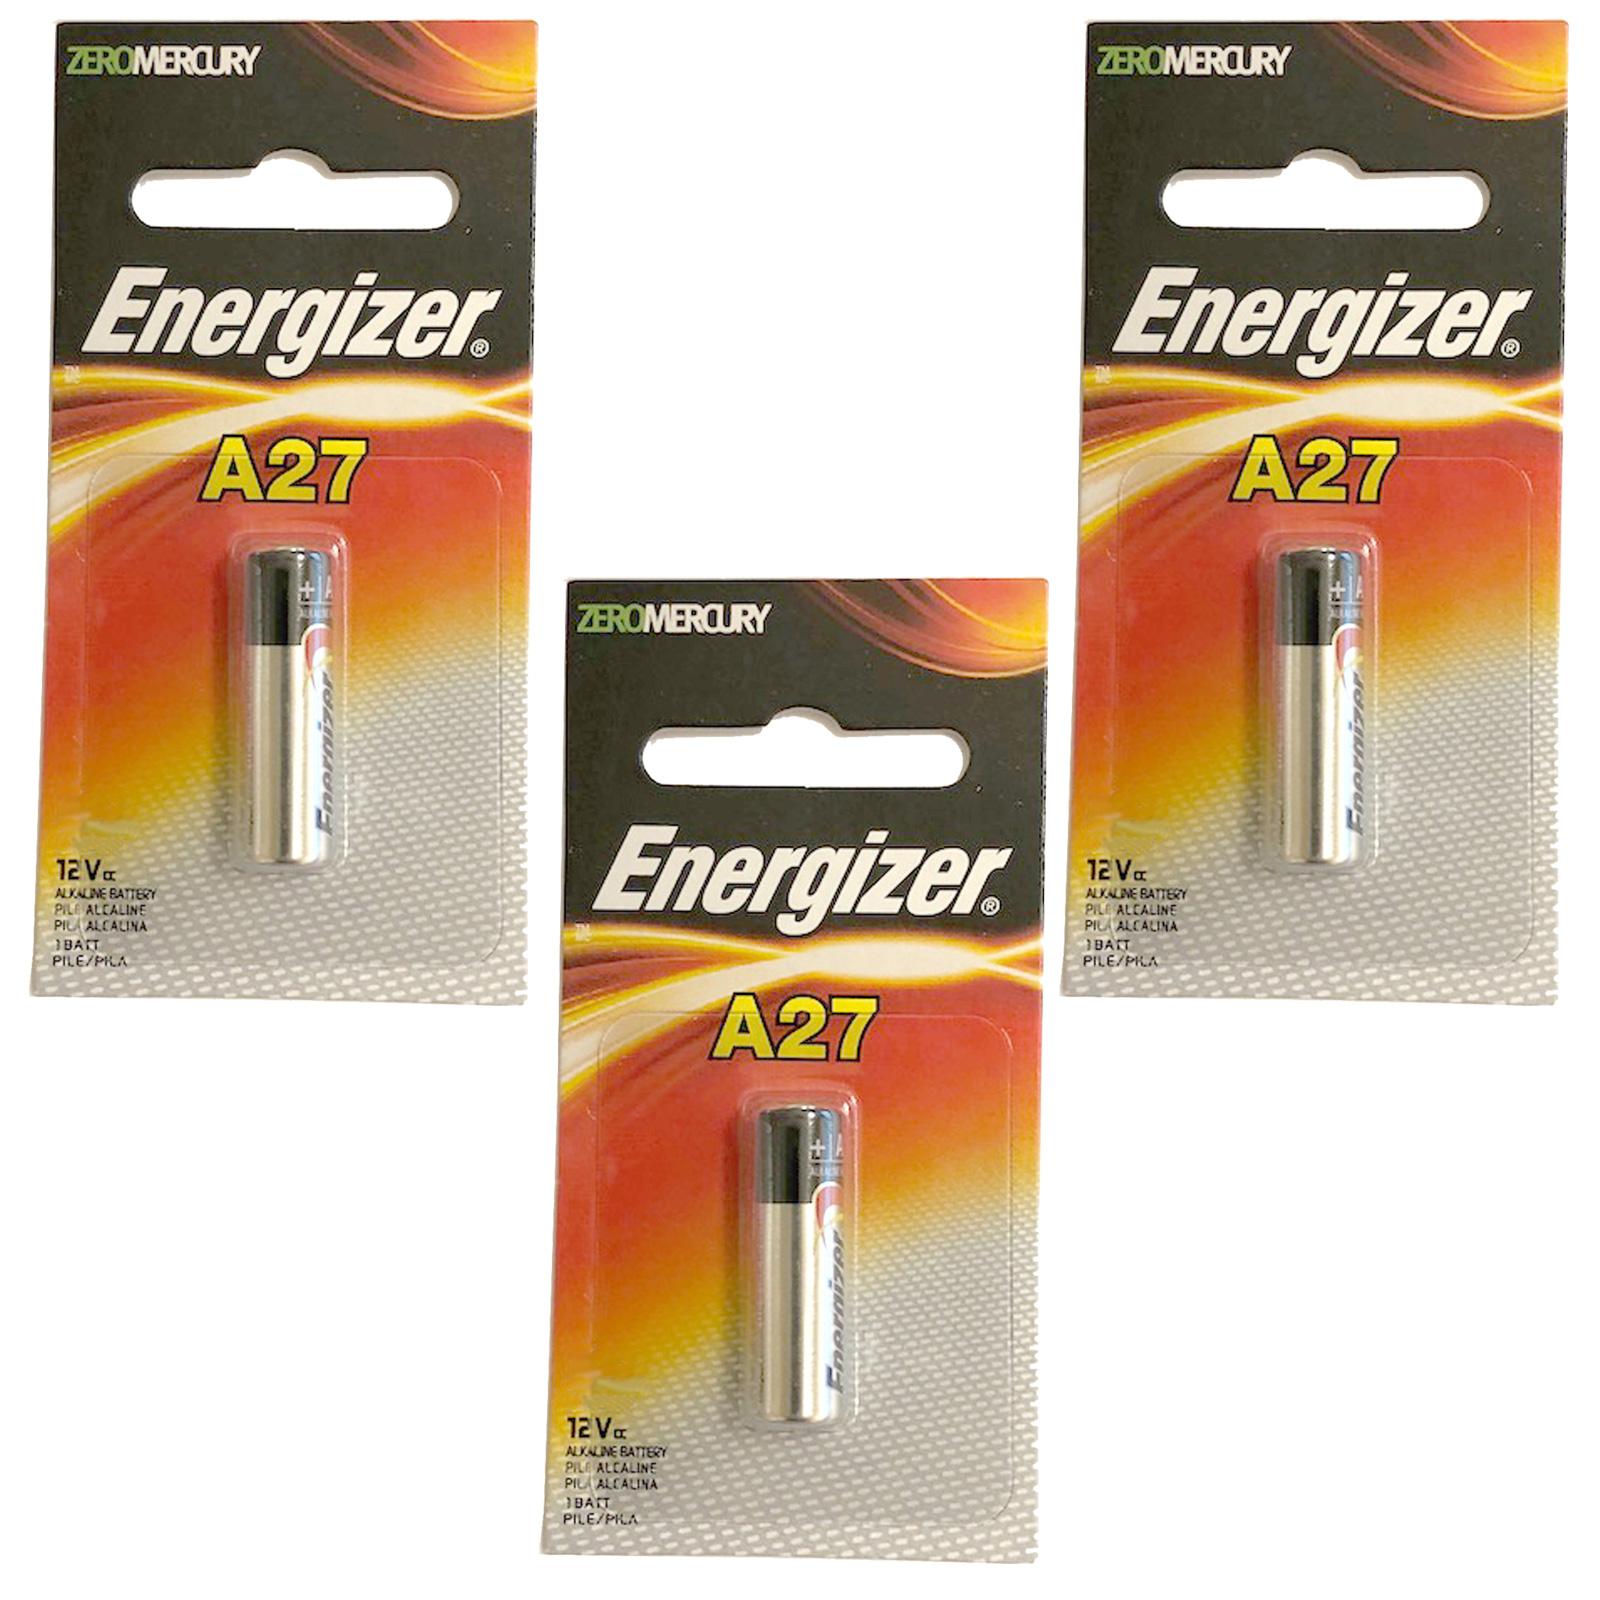 5pcs A27 Alkaline 12V Batteries G27A MN27 GP27A AG27 L828 Fast USA Ship